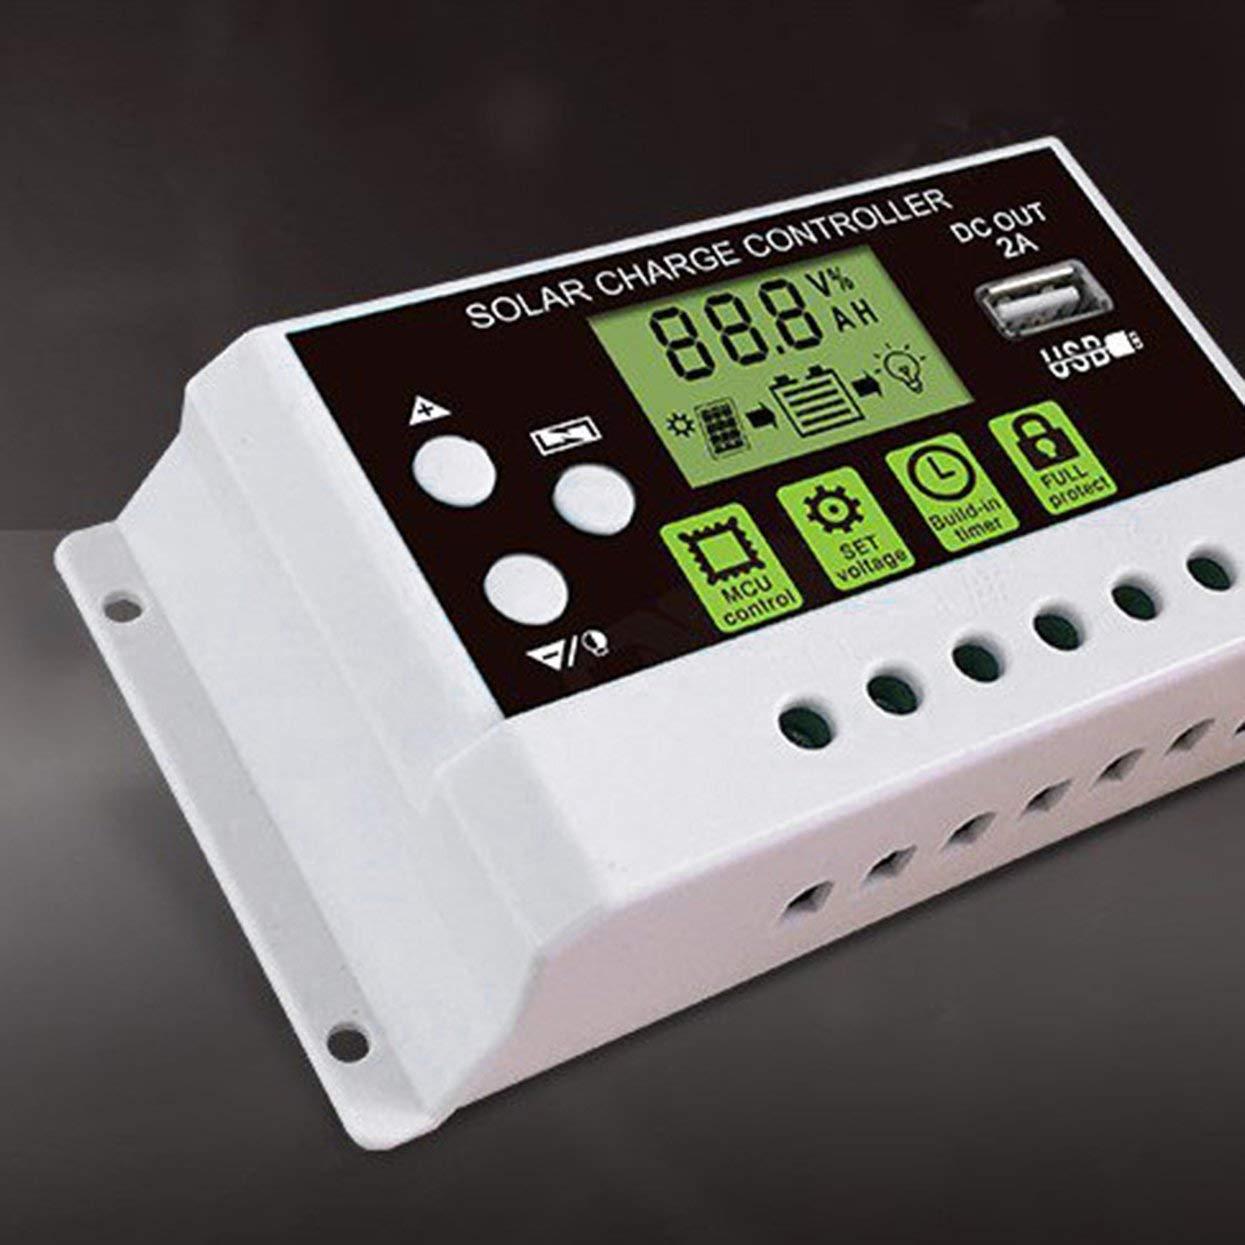 24 V Solarladeregler Wechselschalter LCD-Display Solarpanel Batterie Regler Laderegler f/ür Lithium-Batterie Tree-on-Life 10A 12 V